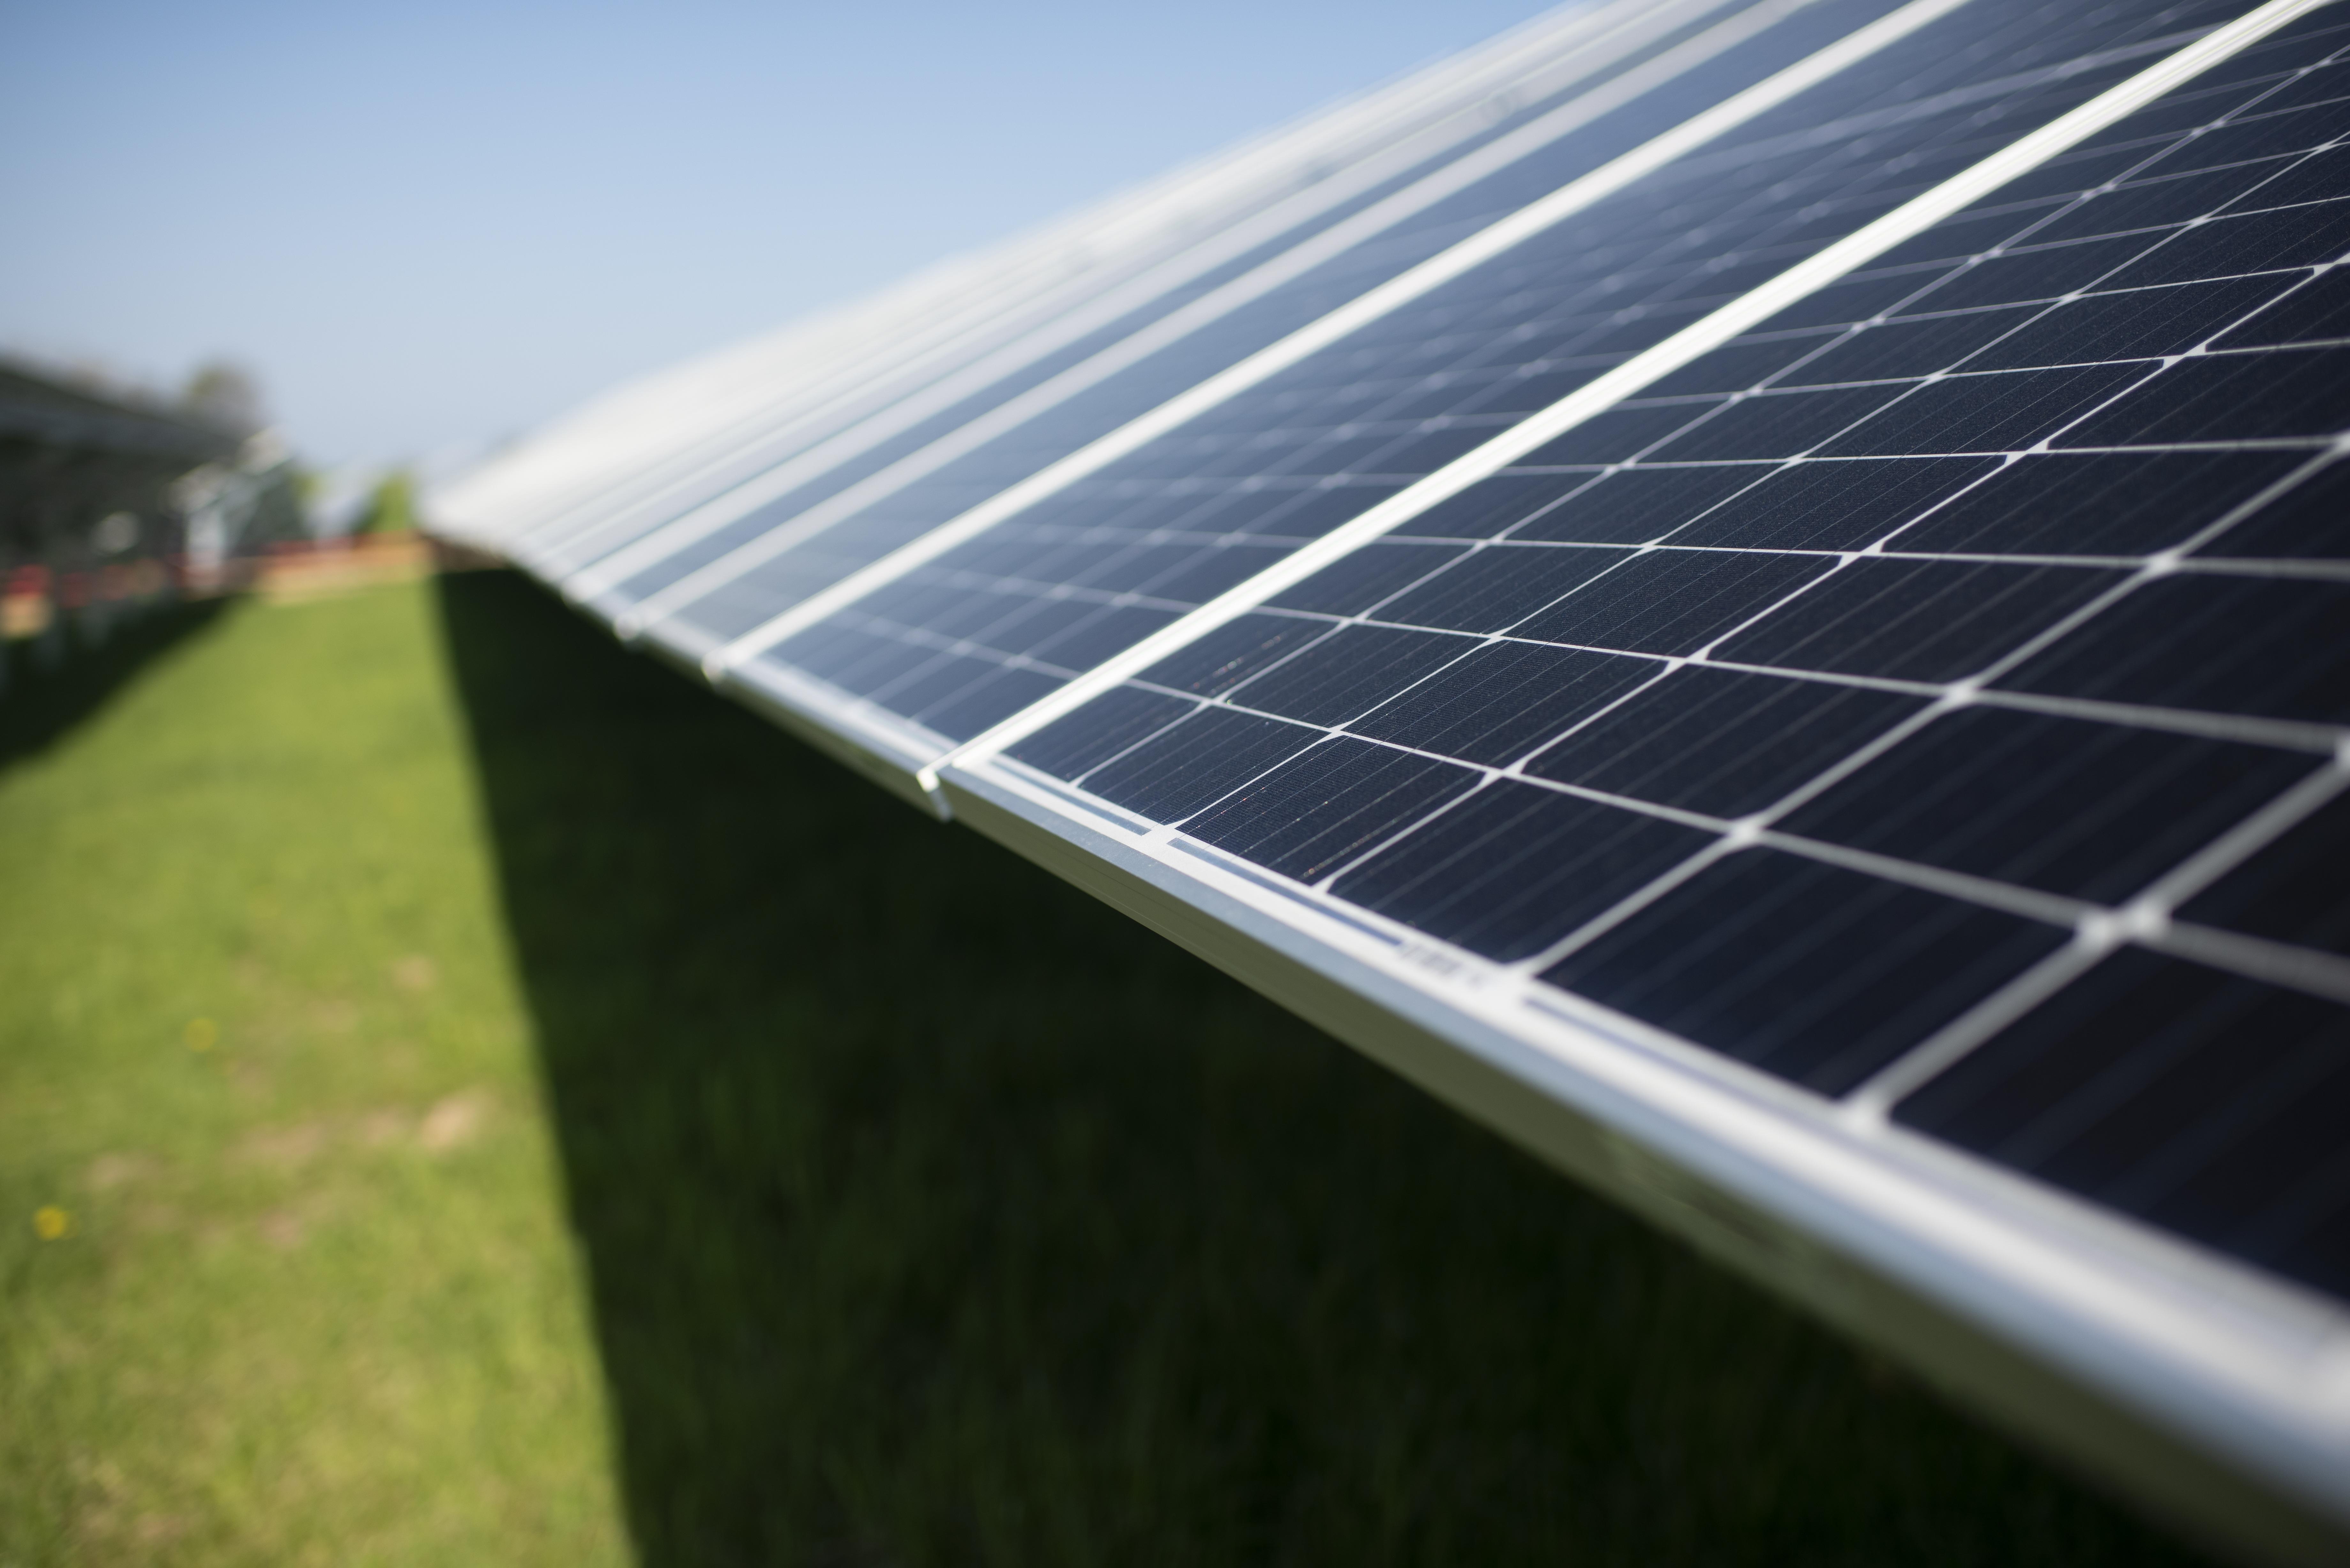 Cashton-Solar-Panels_WI_051519_0053.jpg